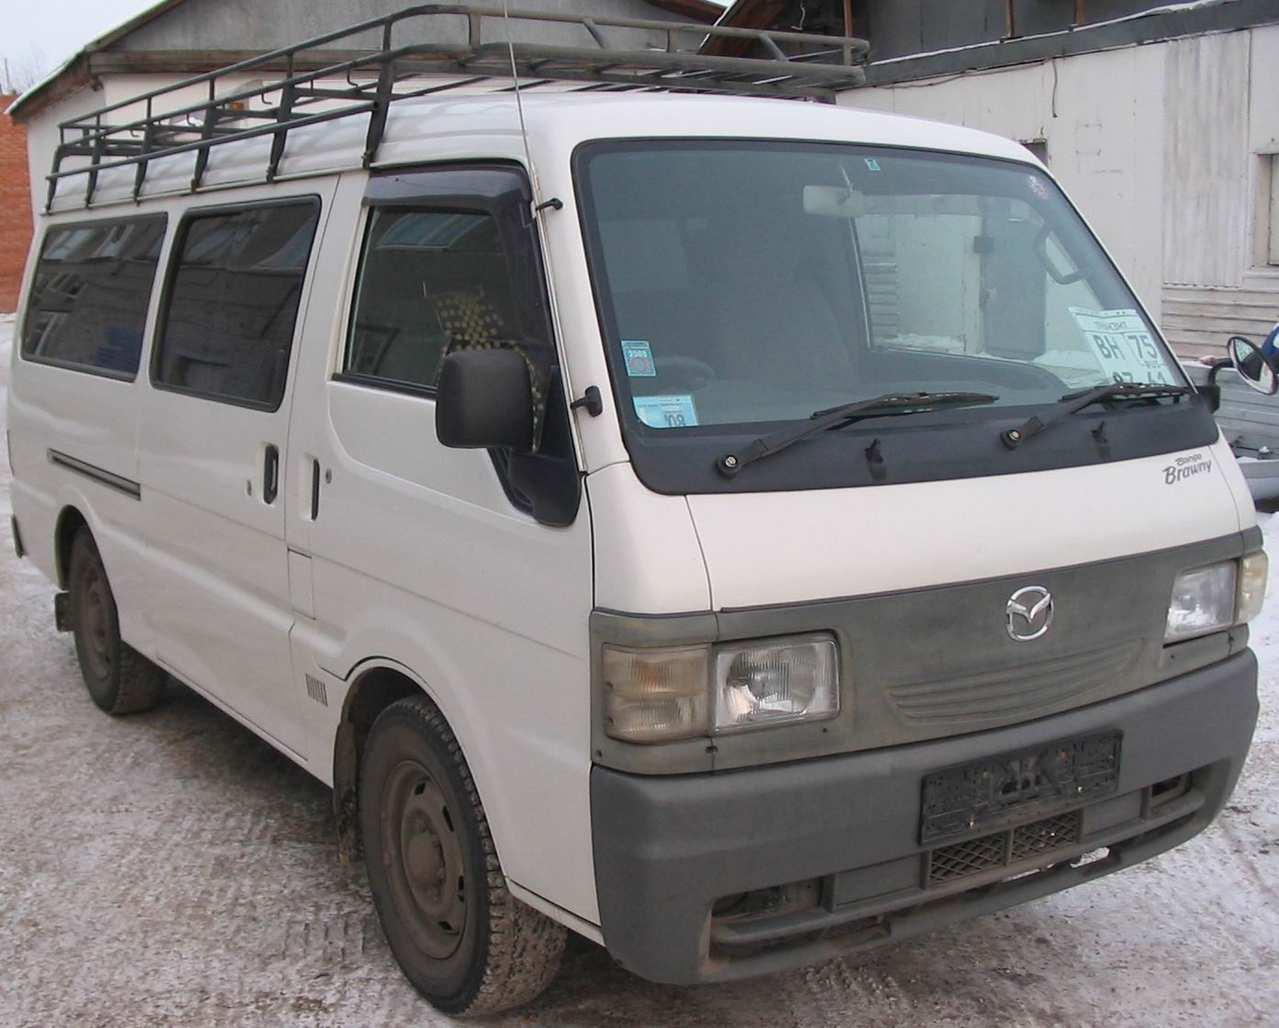 Used 2000 Mazda Bongo Brawny Photos, 2500cc., Diesel, FR or RR, Manual For Sale